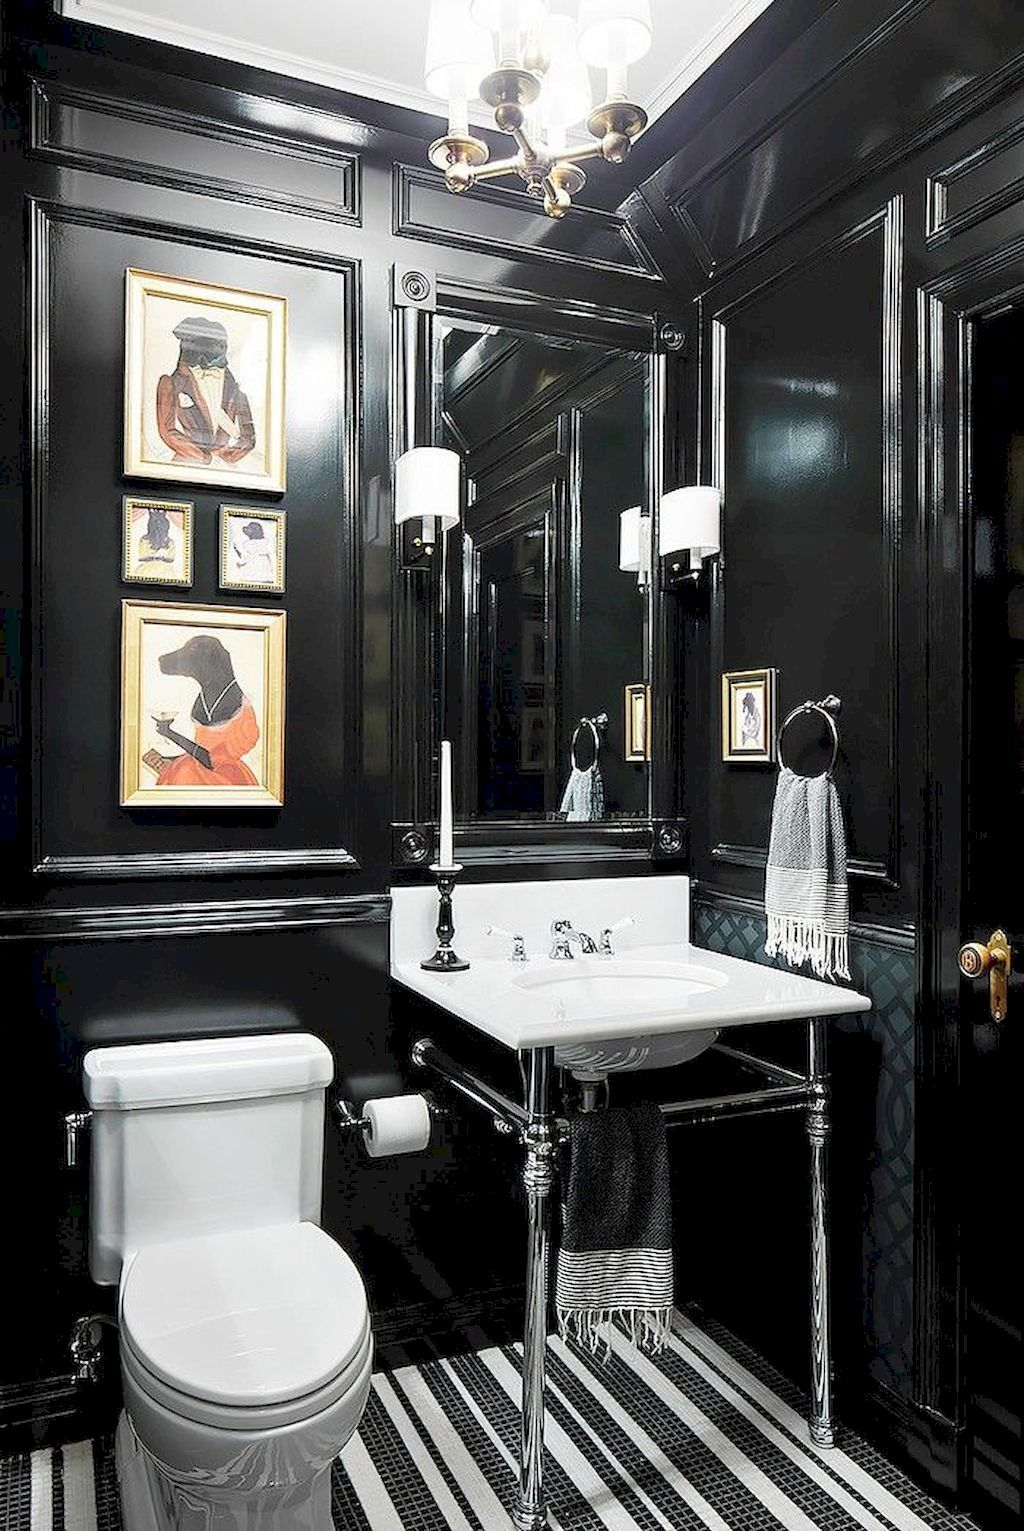 Nice 111 Brilliant Small Bathroom Remodel Ideas On A Budget https://livingmarch.com/111-brilliant-small-bathroom-remodel-ideas-budget/